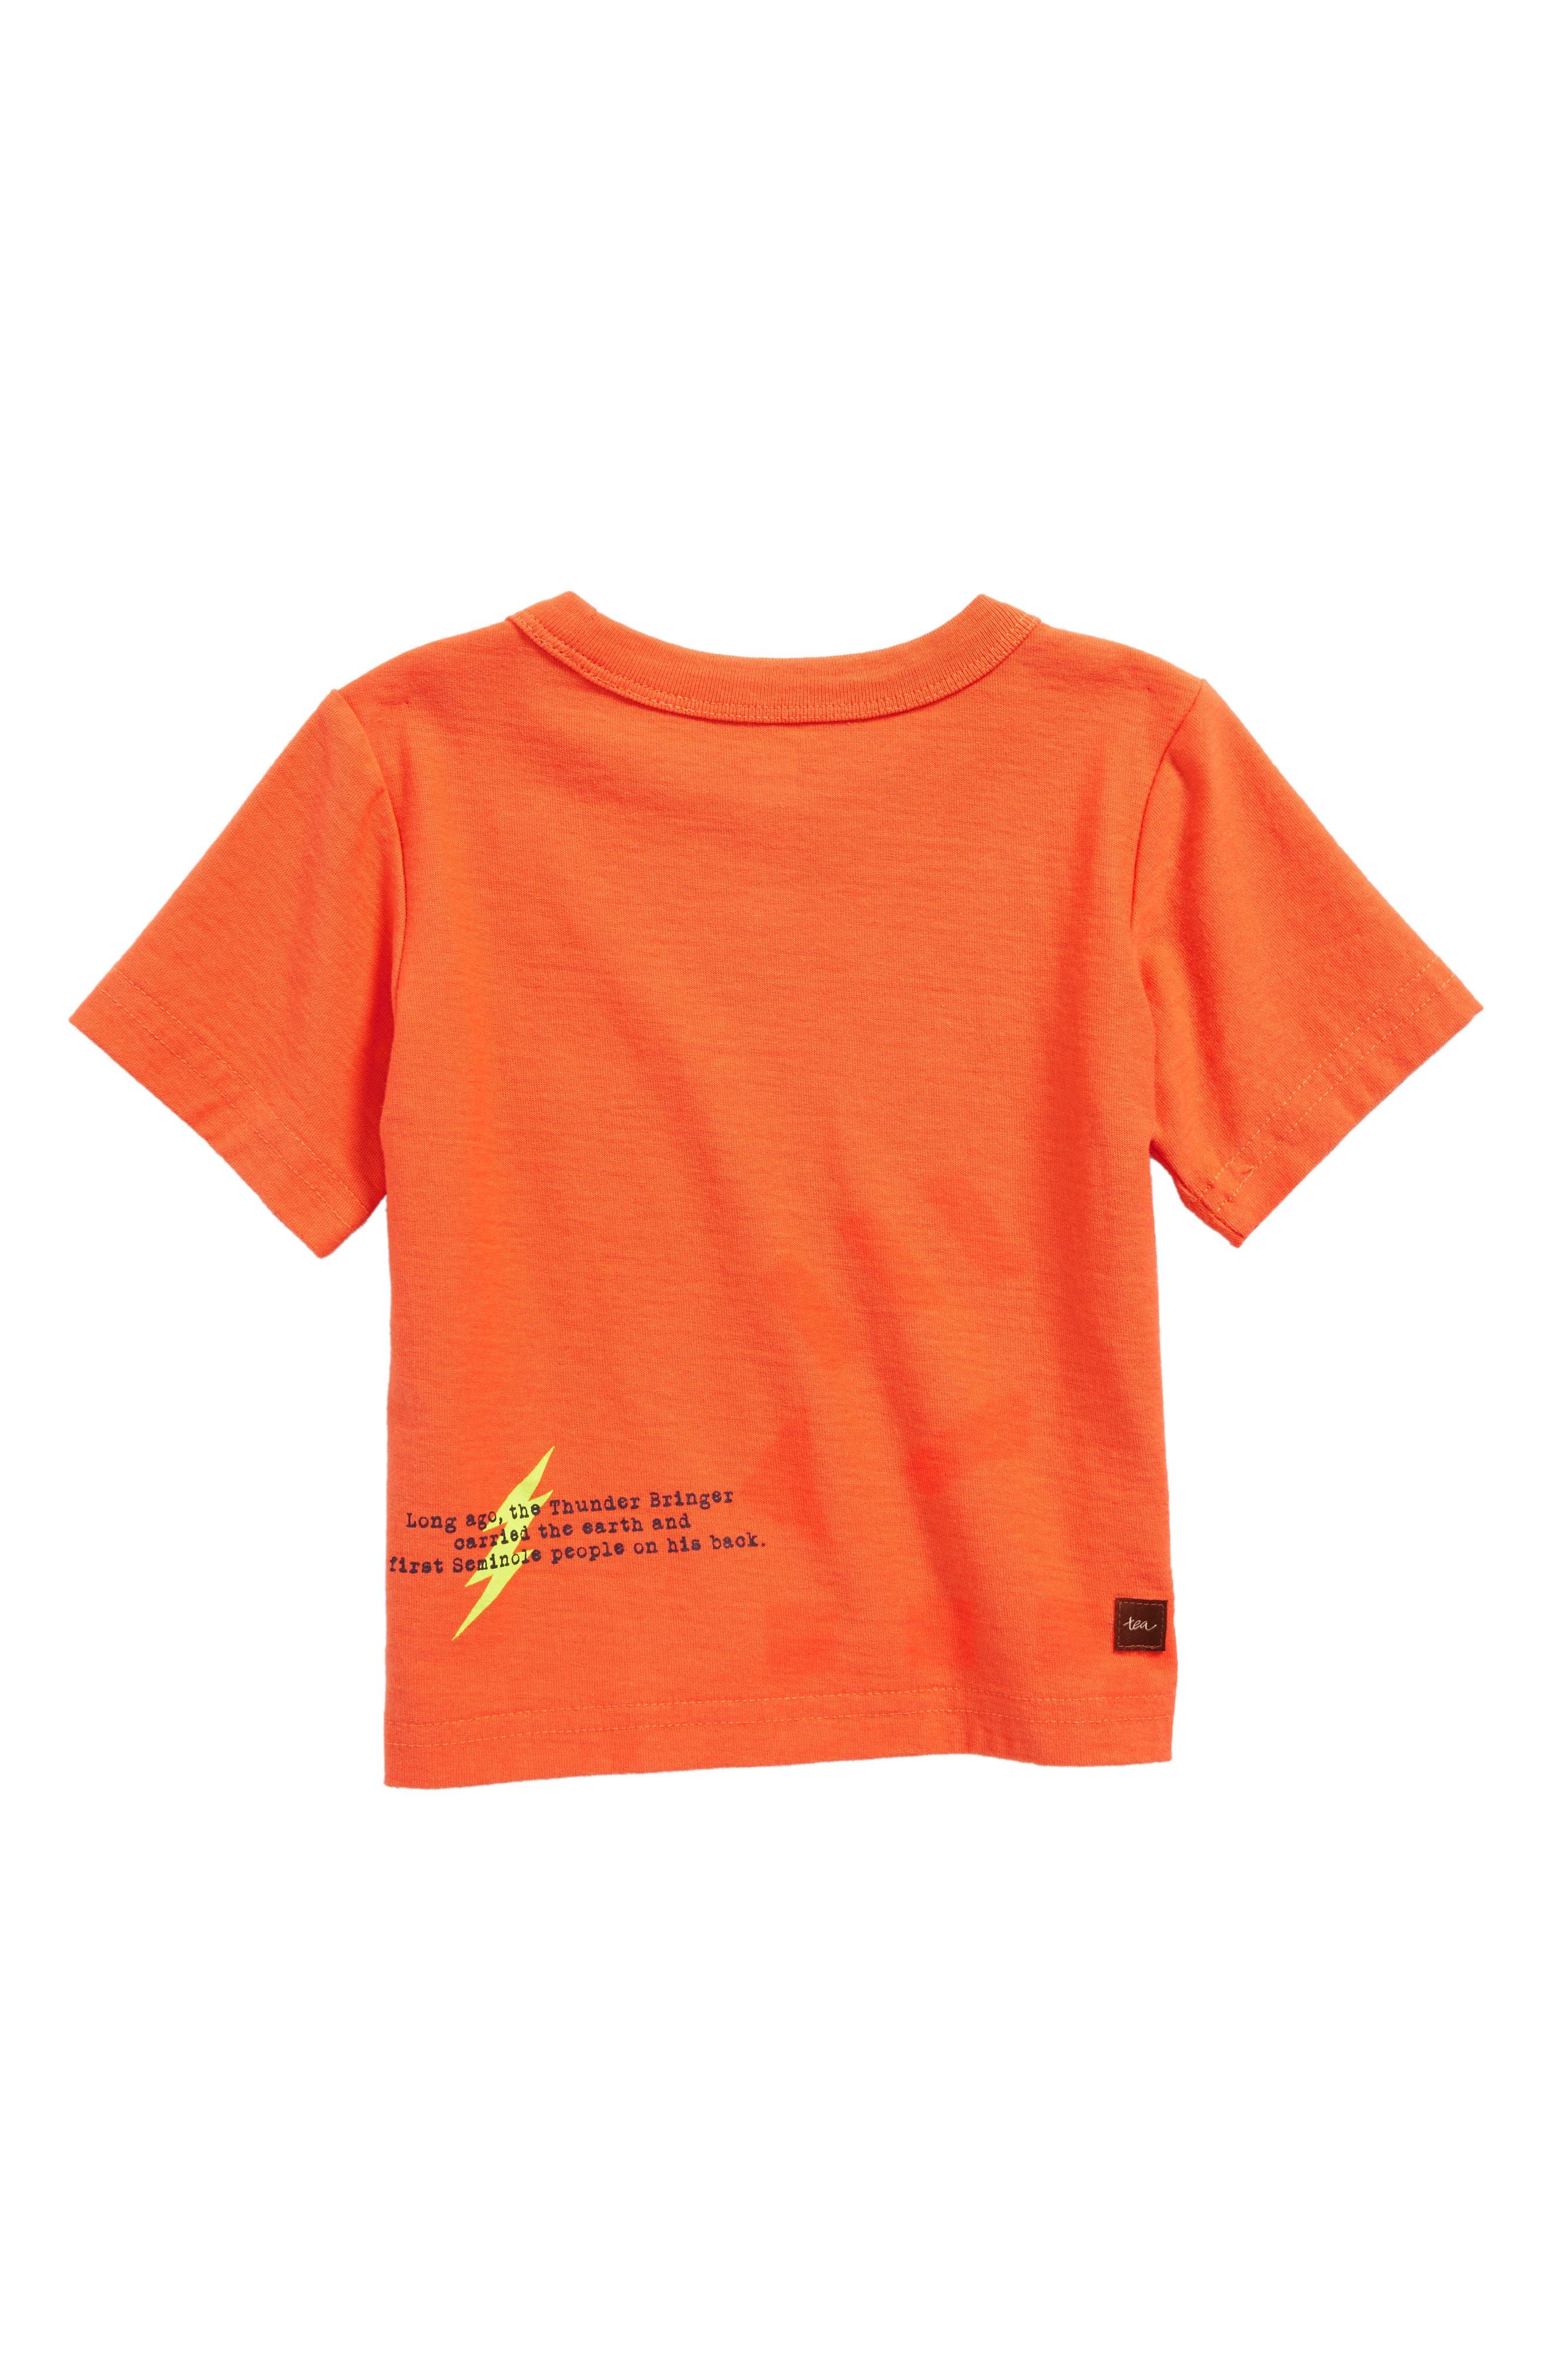 Alternate Image 2  - Tea Collection Thunder Bringer Graphic T-Shirt (Baby Boys)